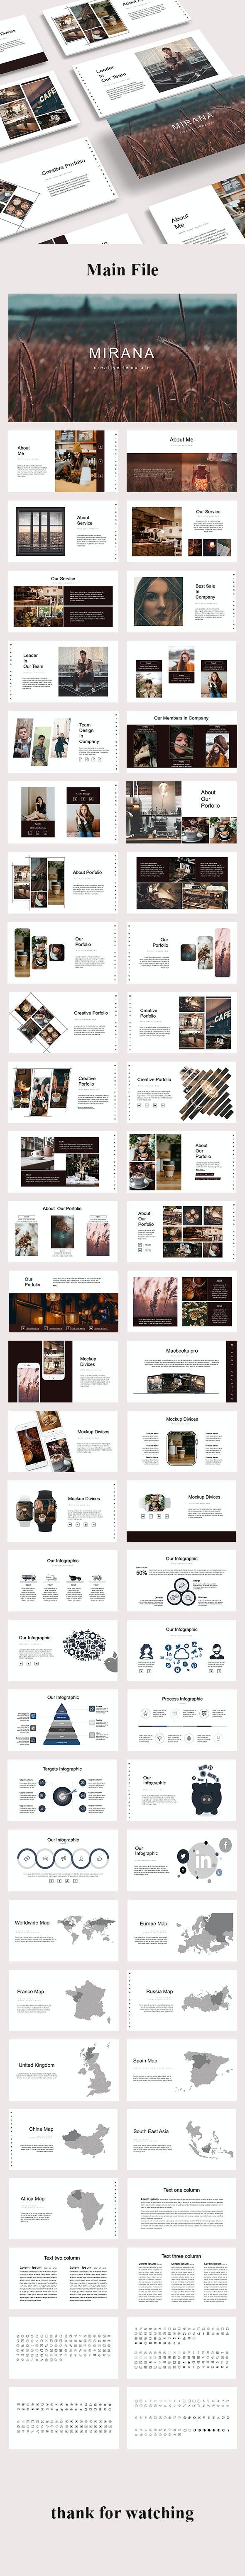 Mirana - Creative Powerpoint Template - Creative PowerPoint Templates